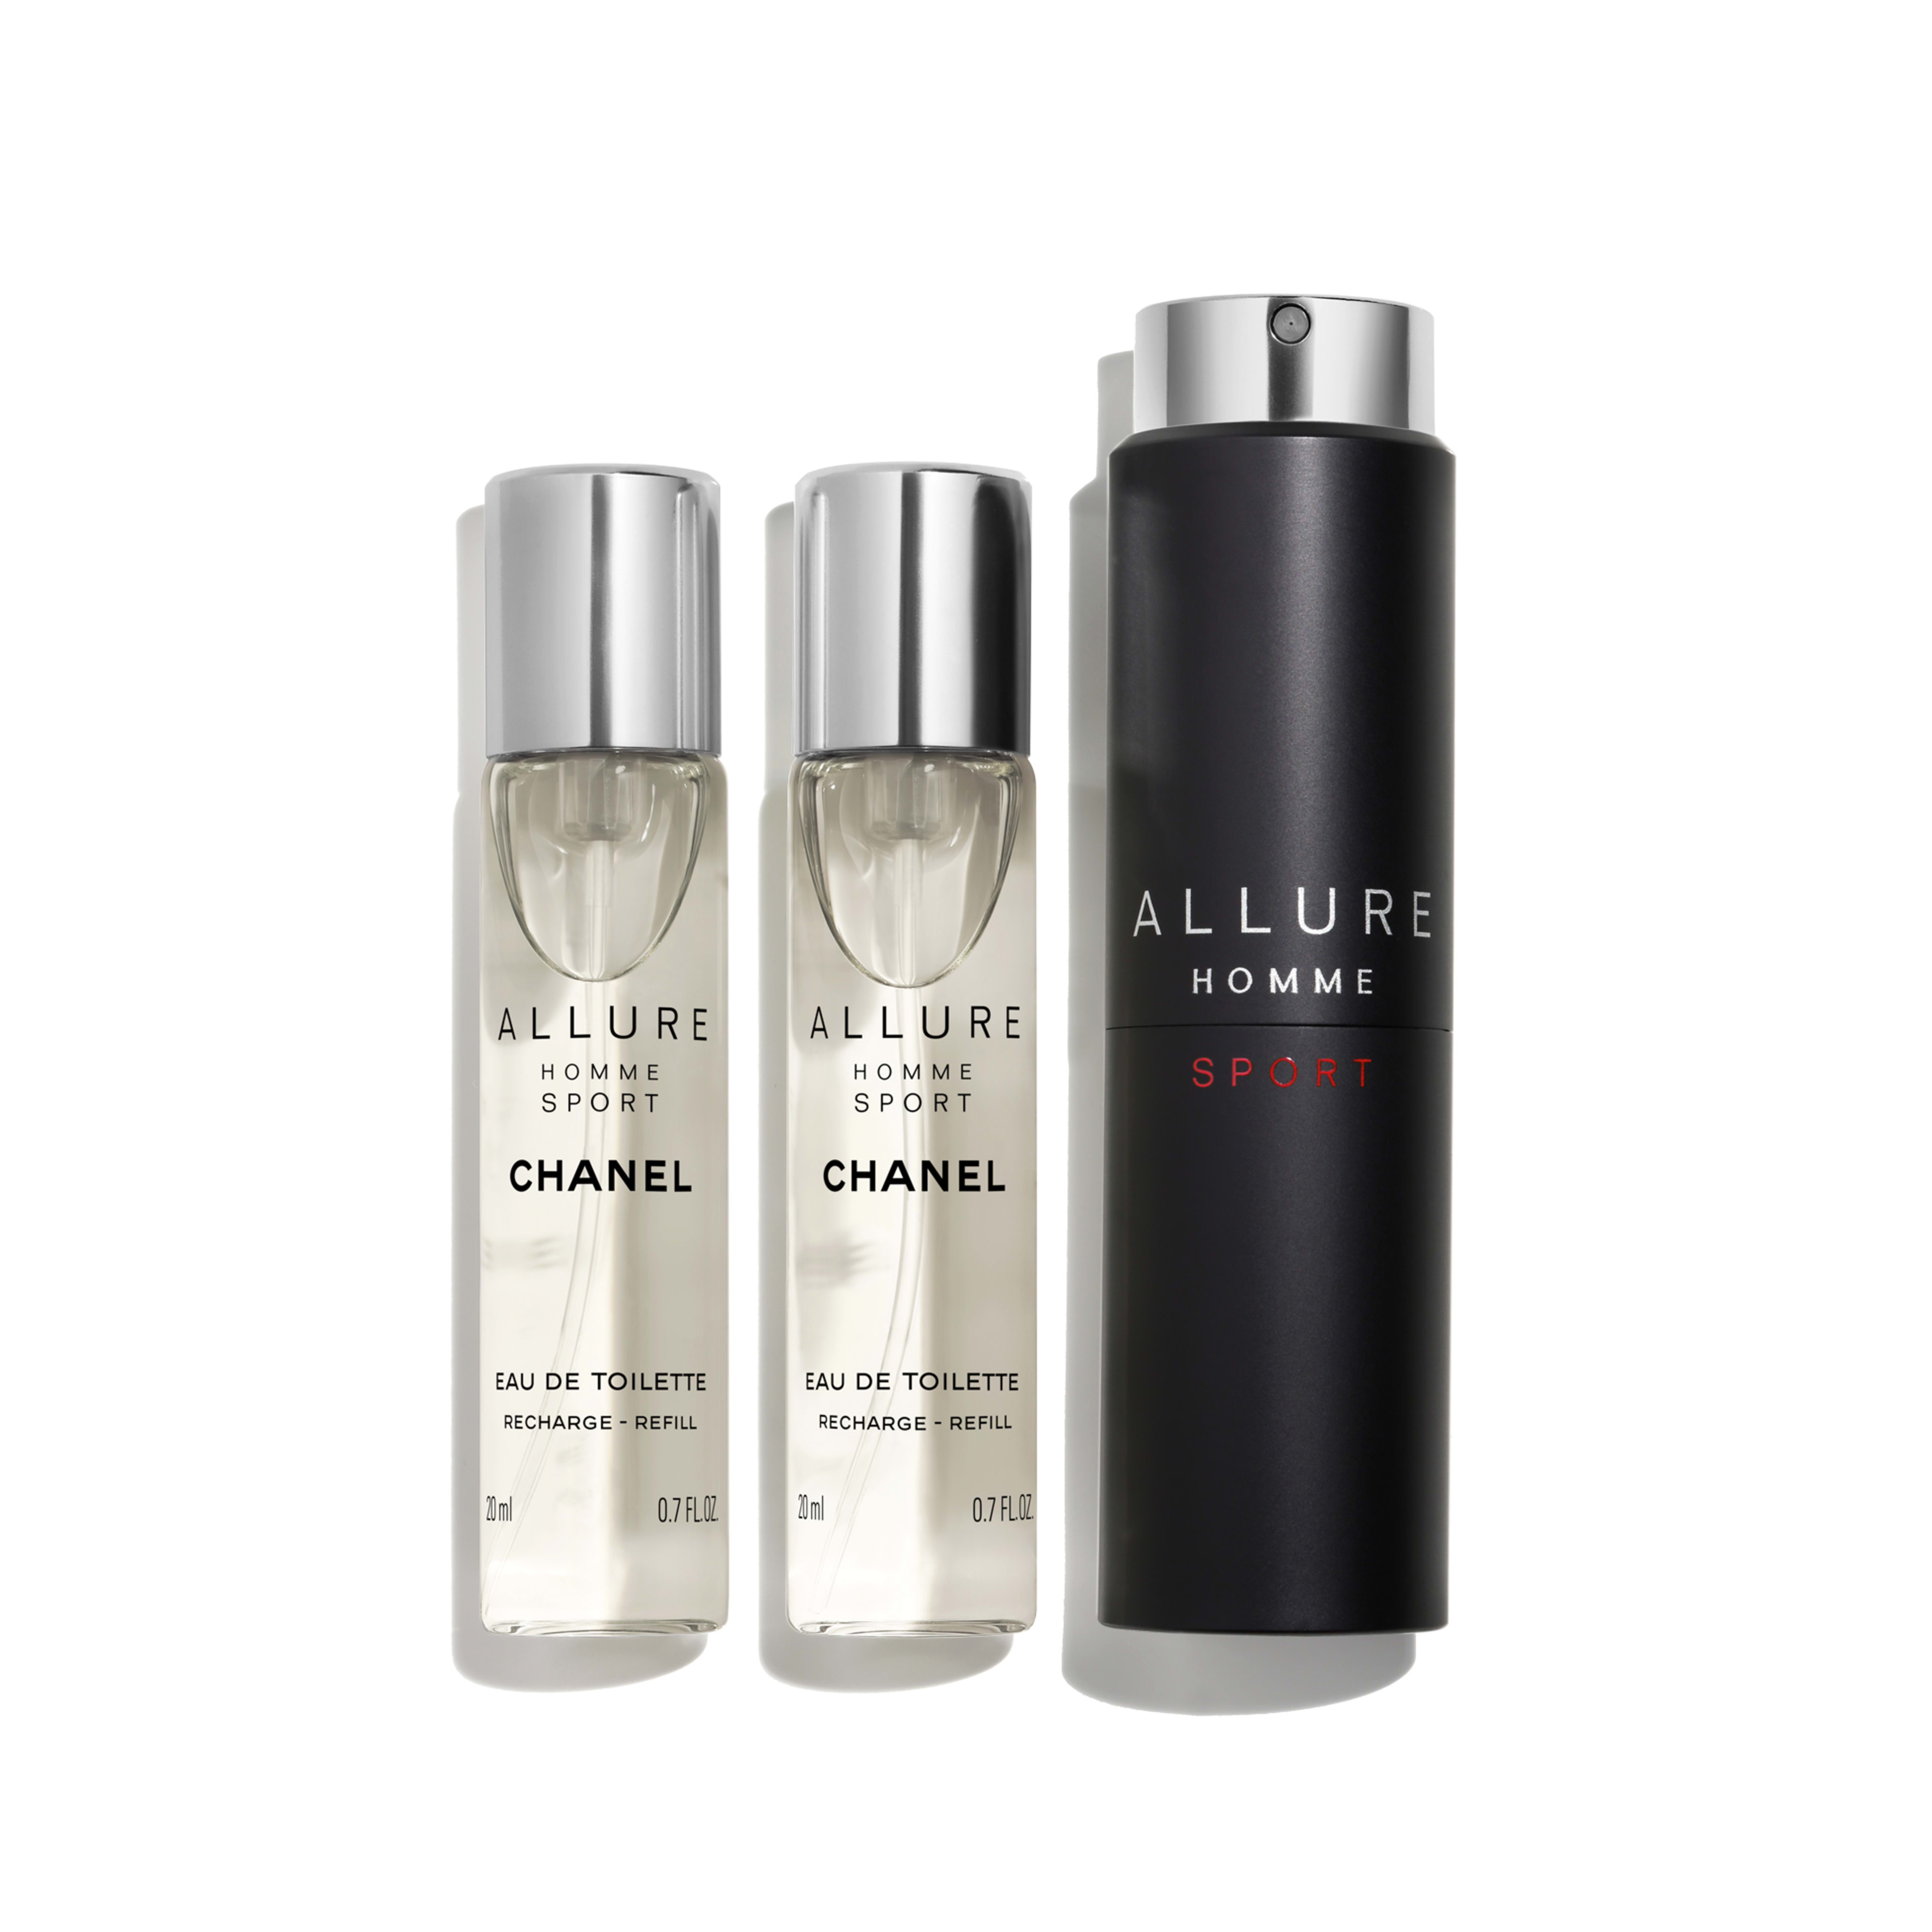 ALLURE HOMME SPORT - fragrance - 3x20ml - Default view